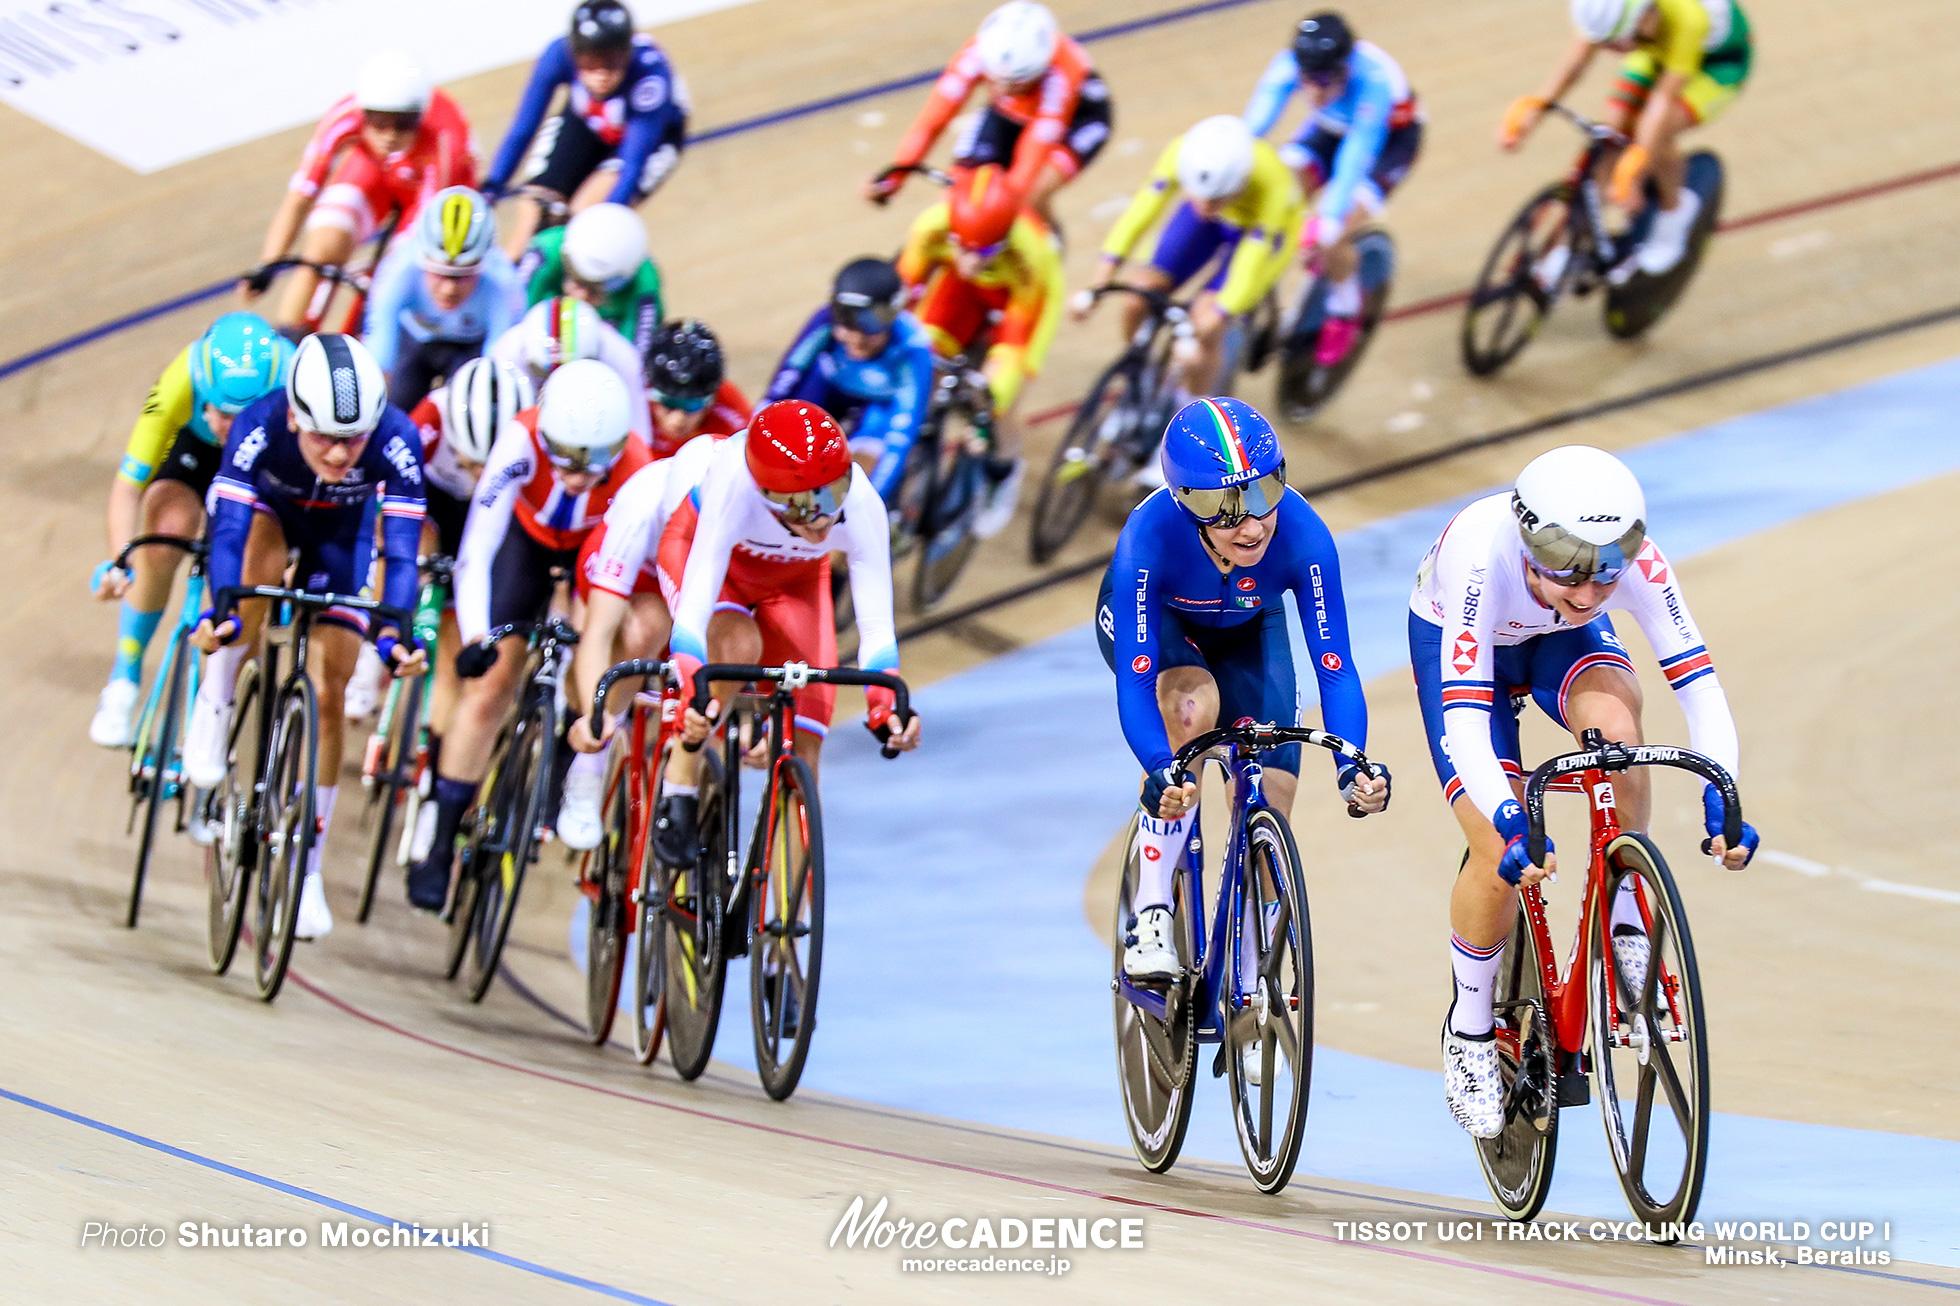 Women's Omnium / Men's Individual Pursuit / TISSOT UCI TRACK CYCLING WORLD CUP I, Minsk, Beralus